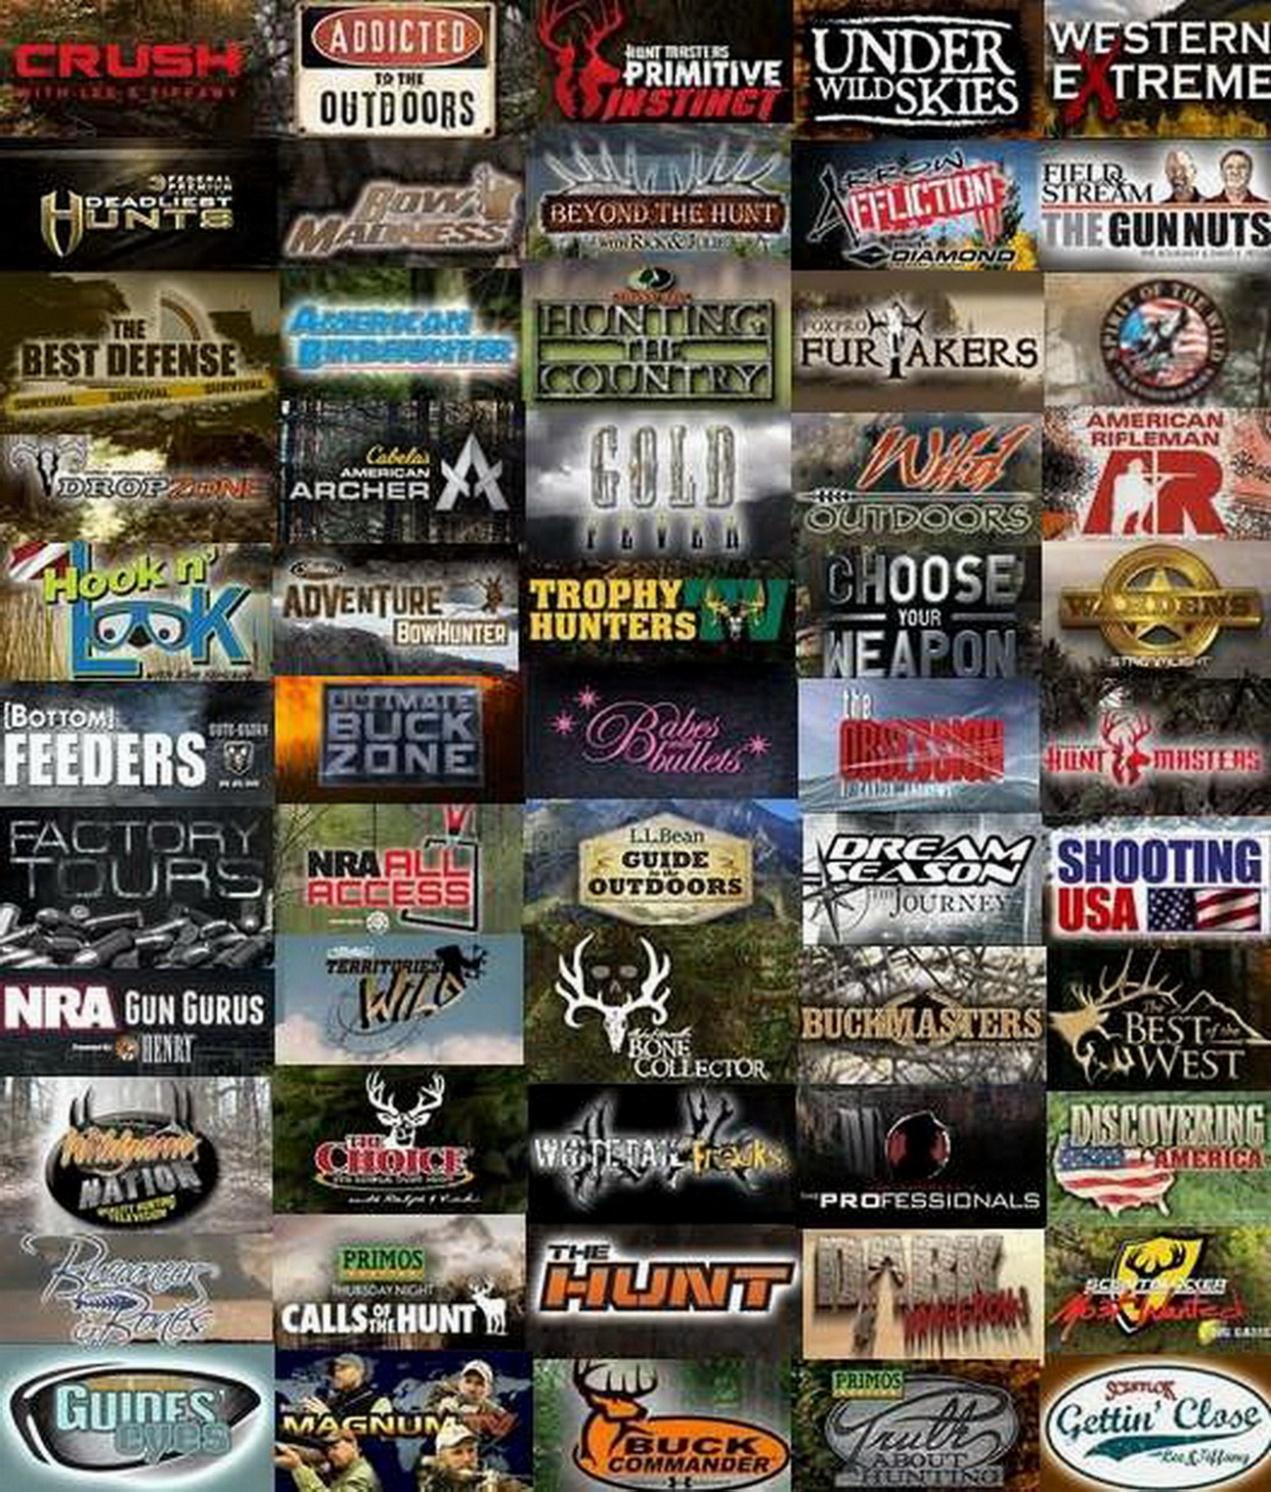 Trophy hunters - Comp TV programs.jpg